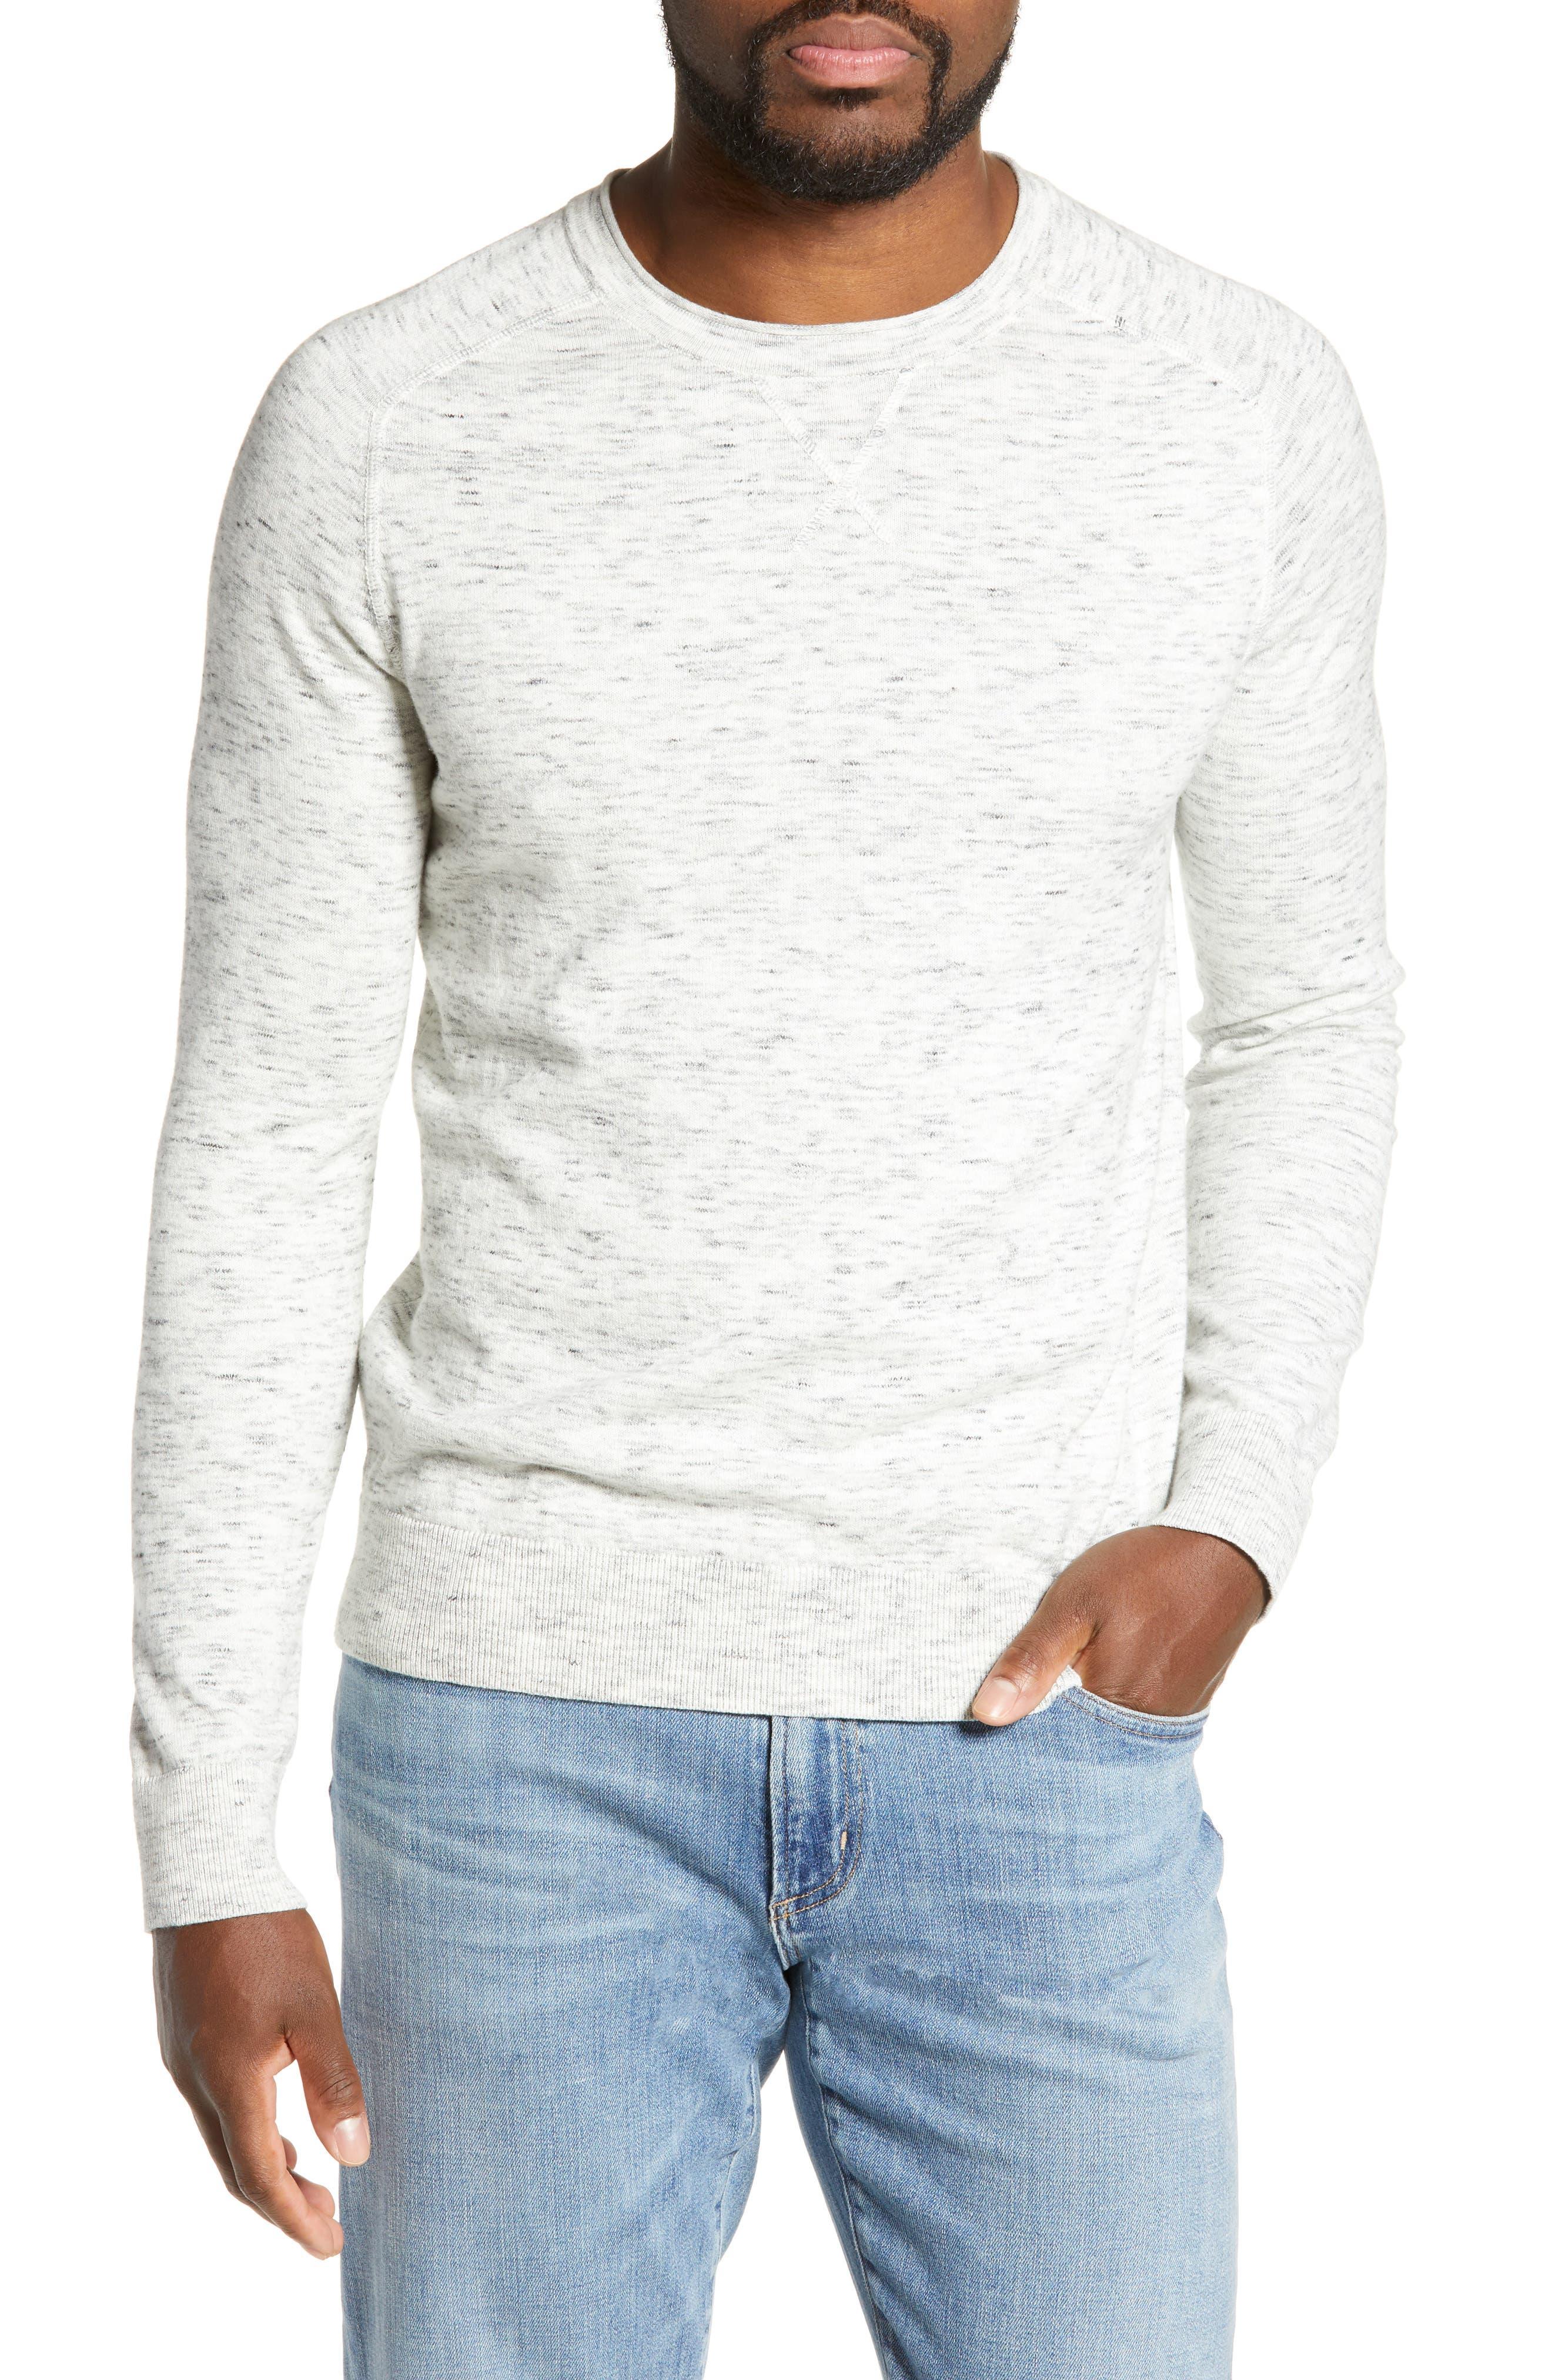 Life/after/denim High Street Slubbed Crewneck Sweater, White